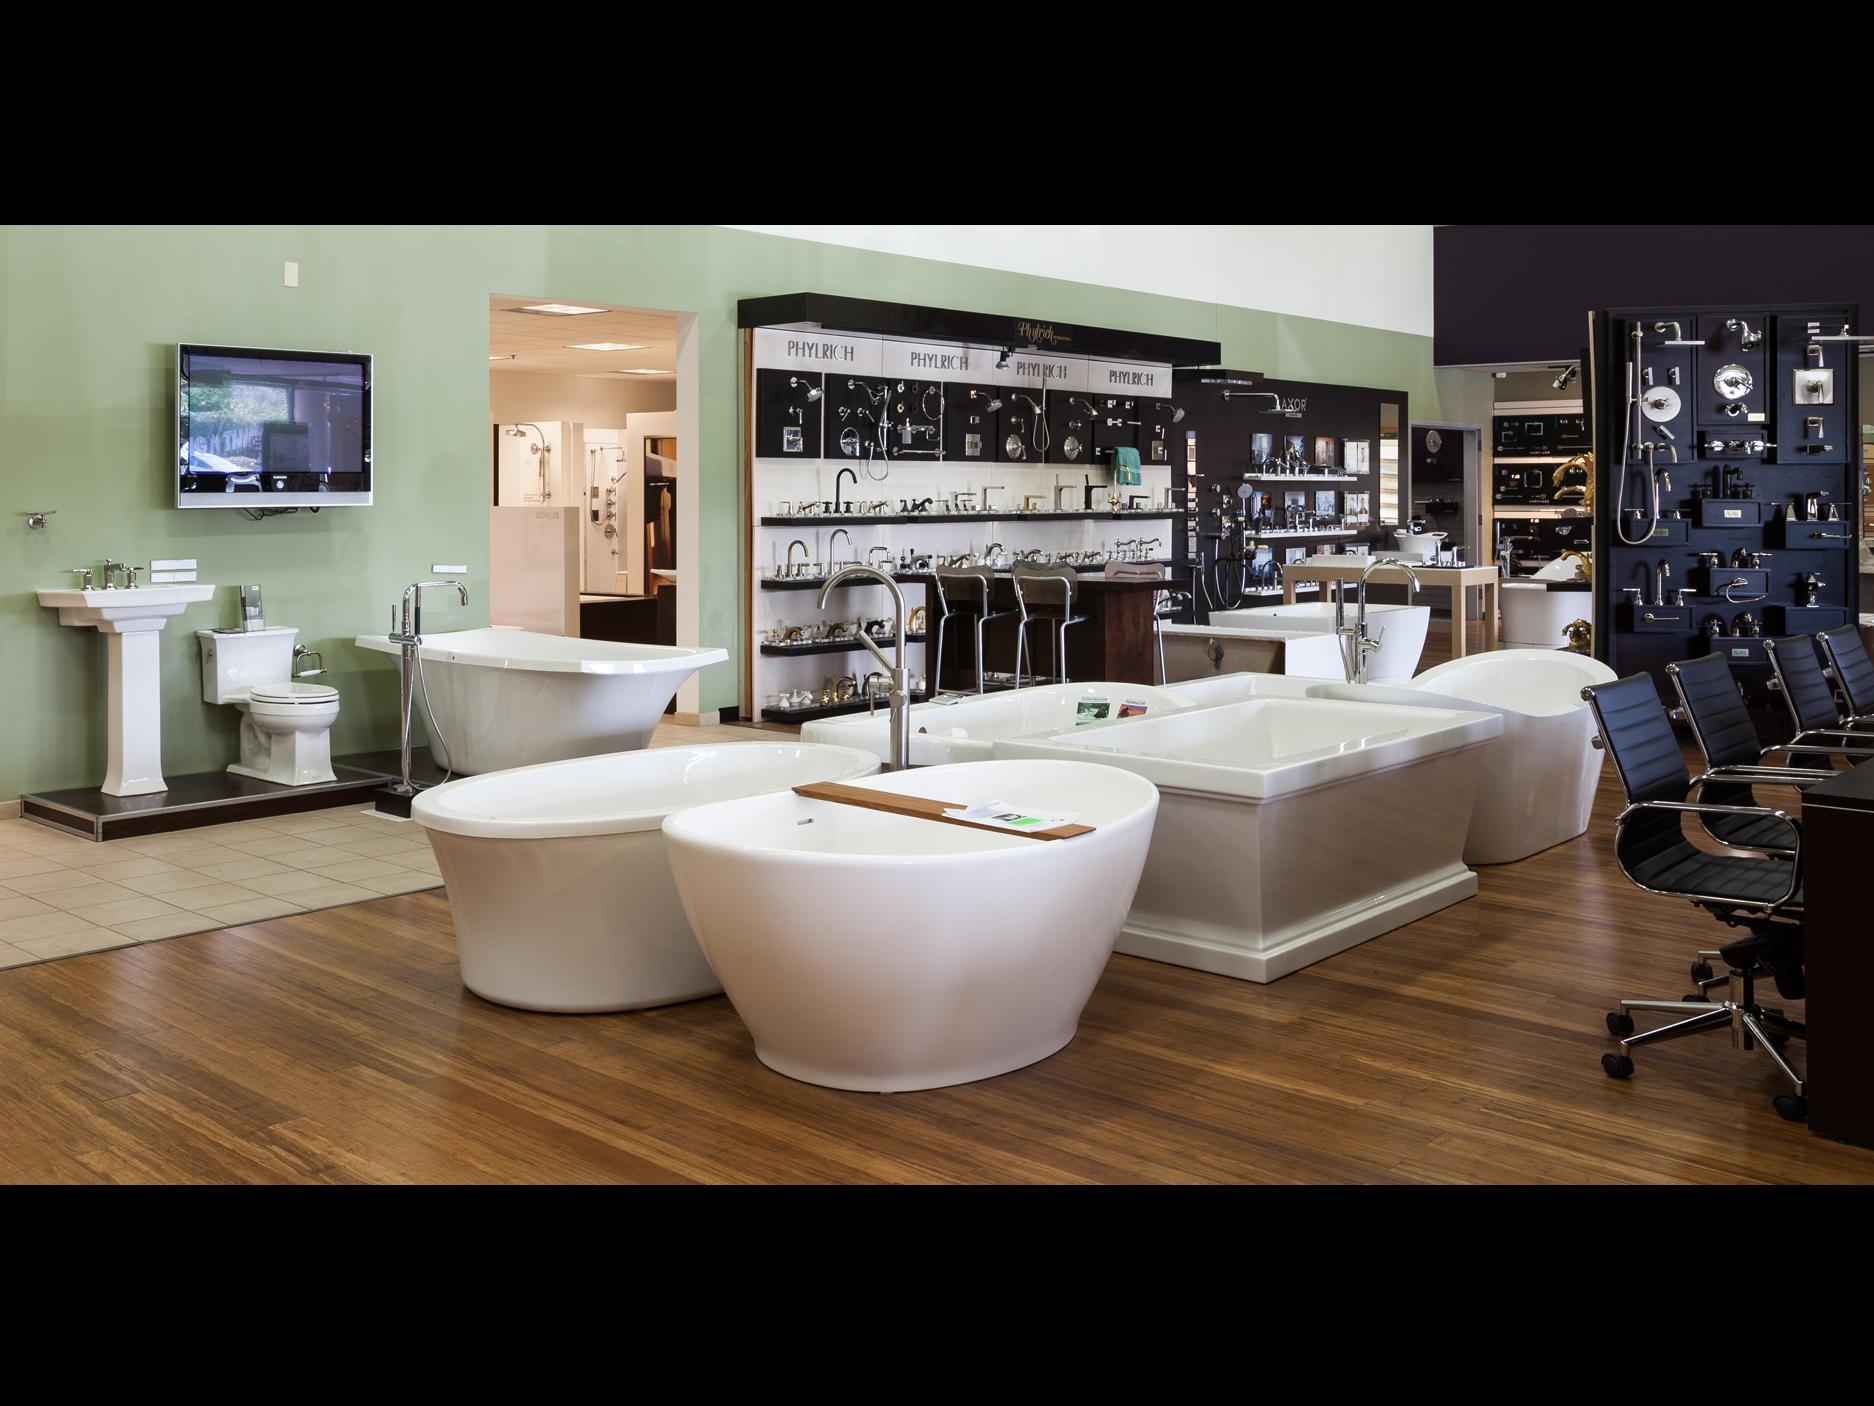 Bathroom Fixtures Redwood City kohler bathroom & kitchen products at plumbing n' things in